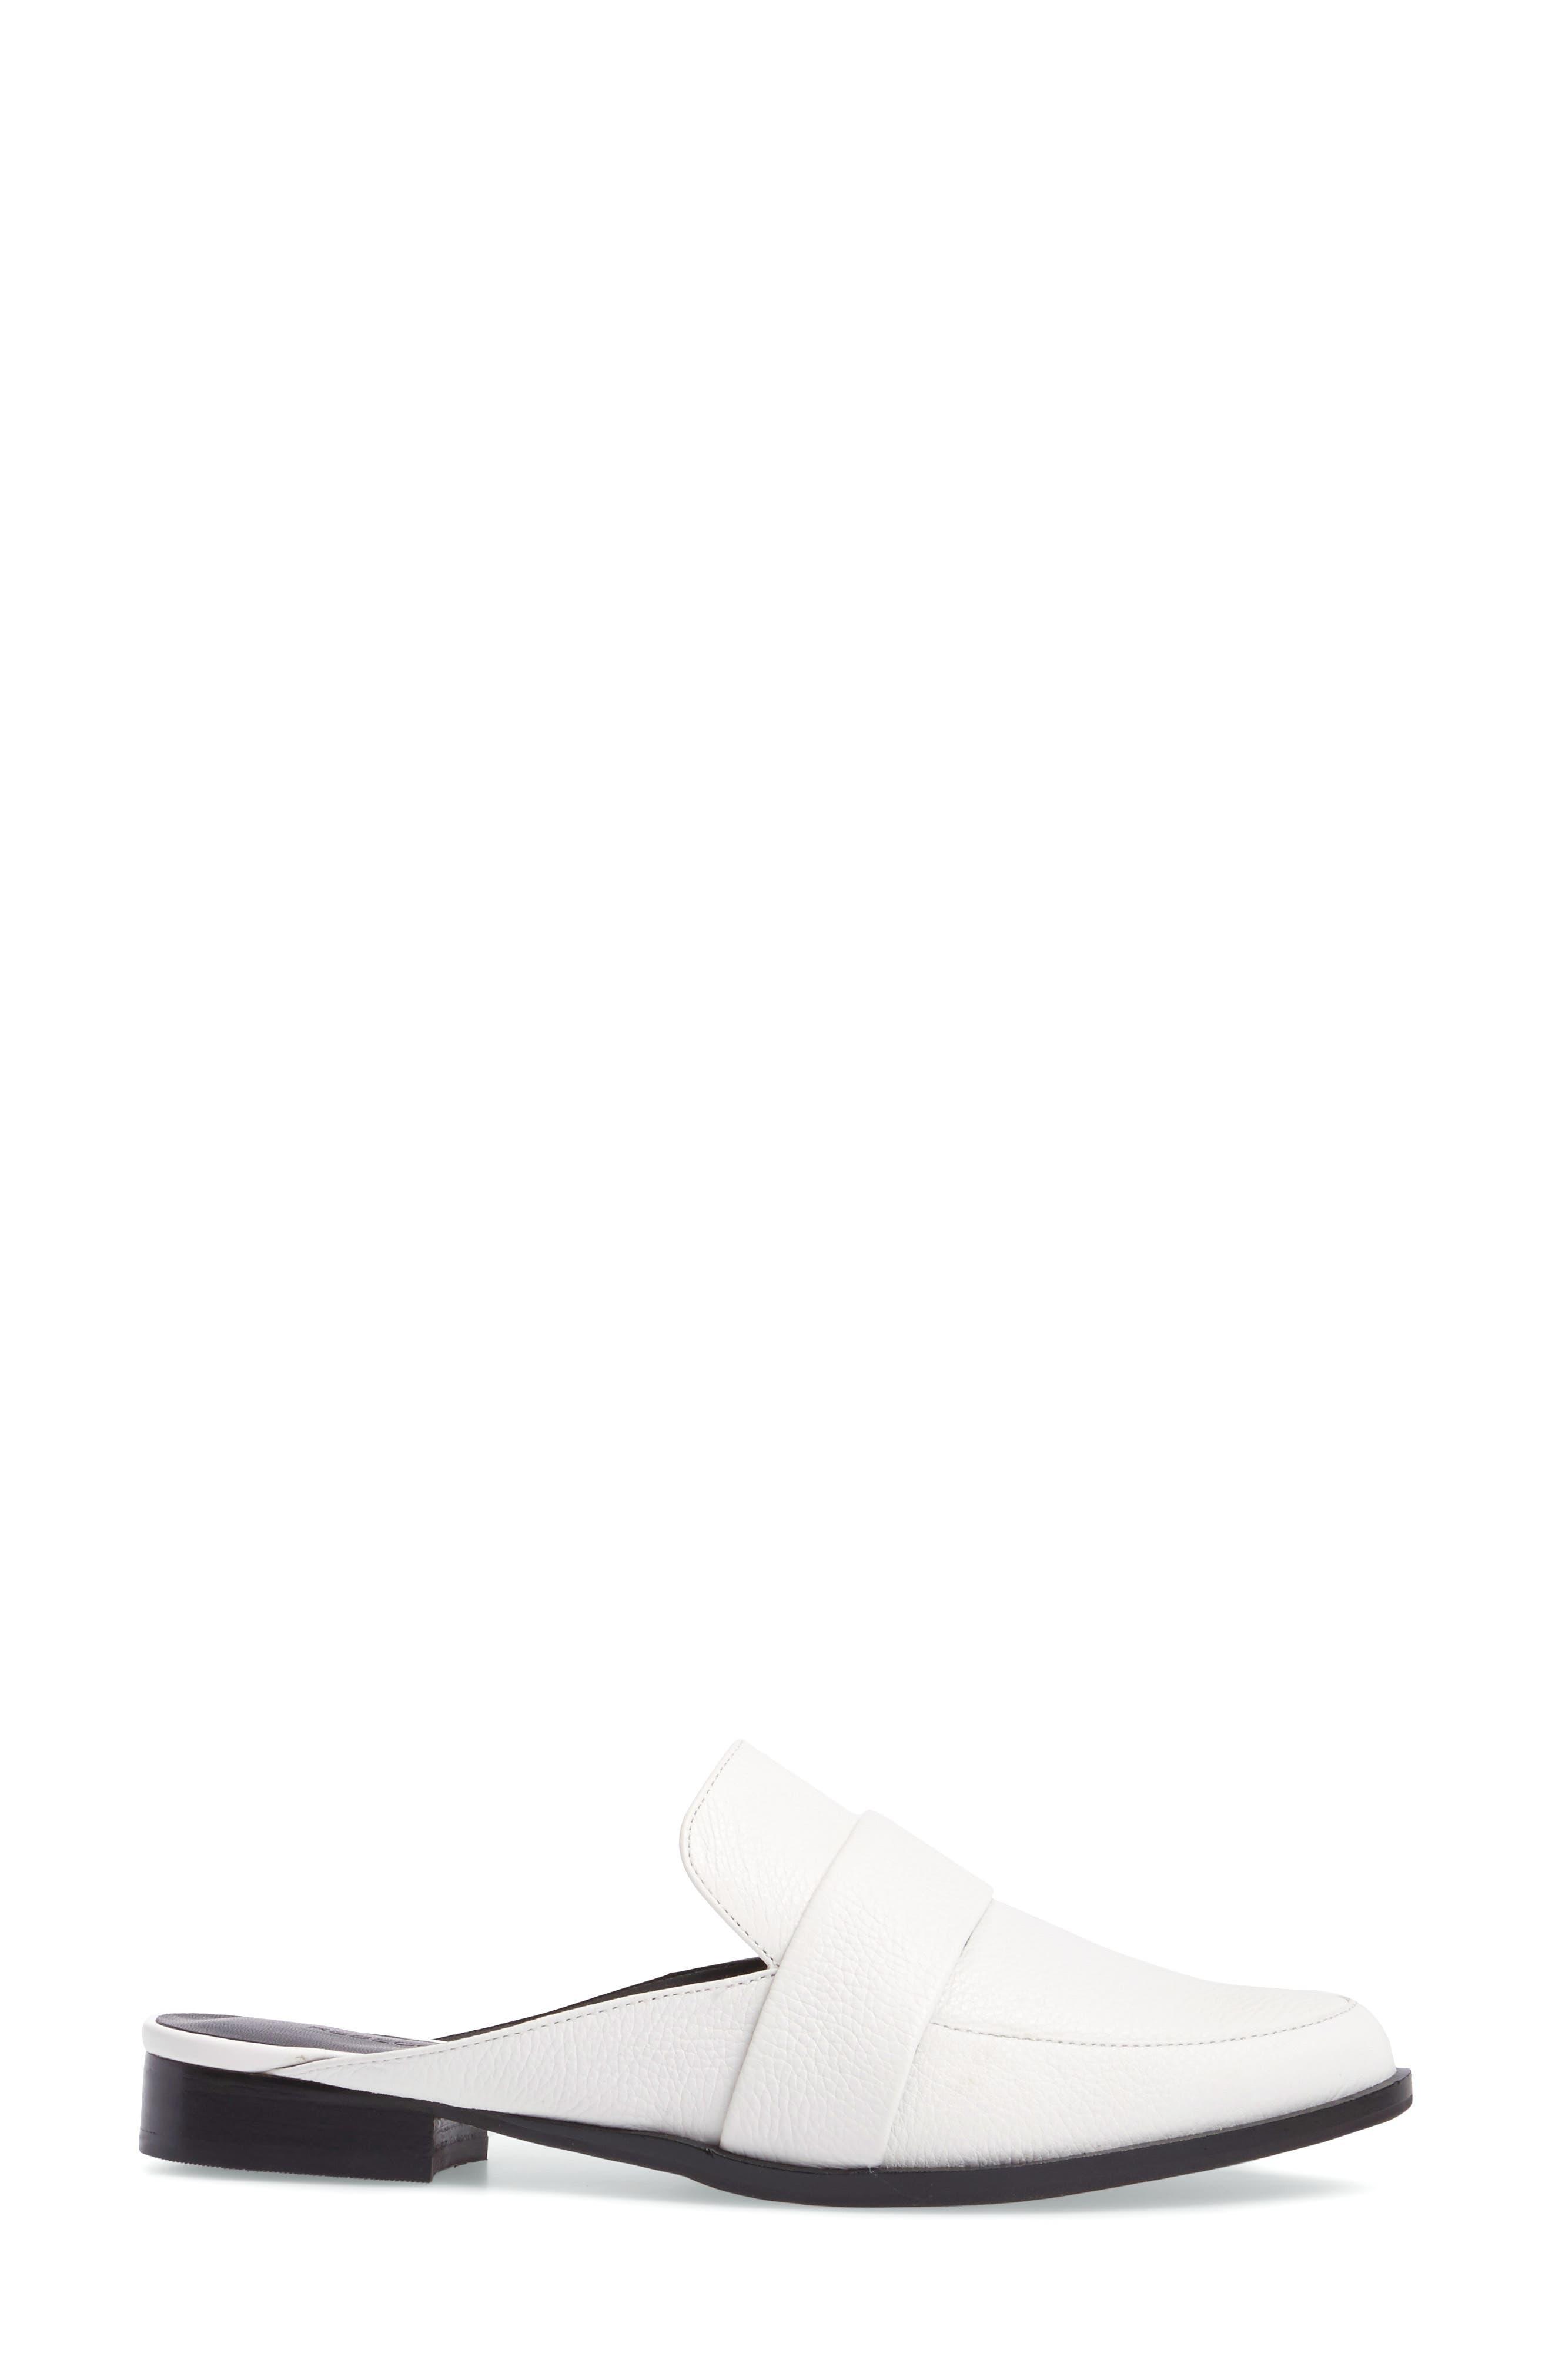 'Mika' Mule,                             Alternate thumbnail 4, color,                             White Leather